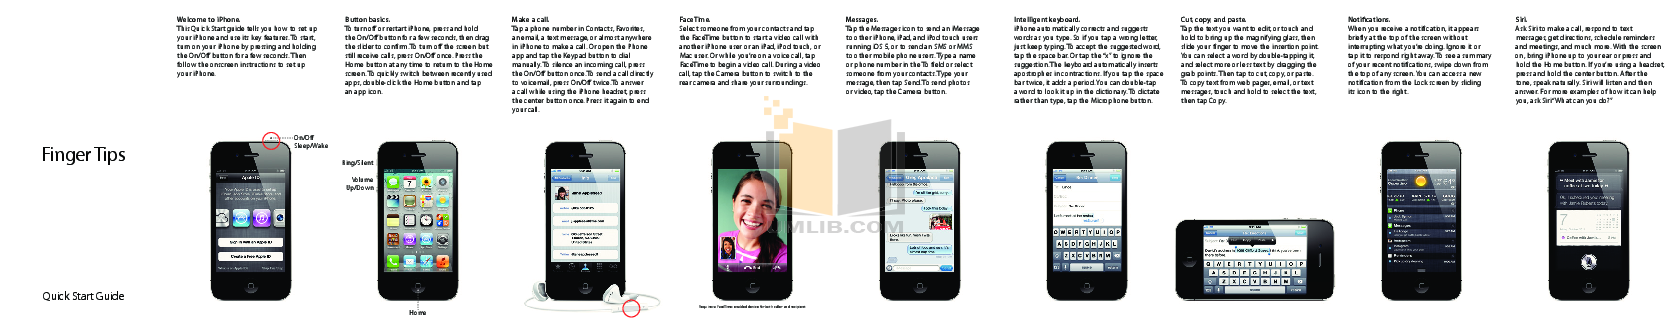 4s manual pdf iphone